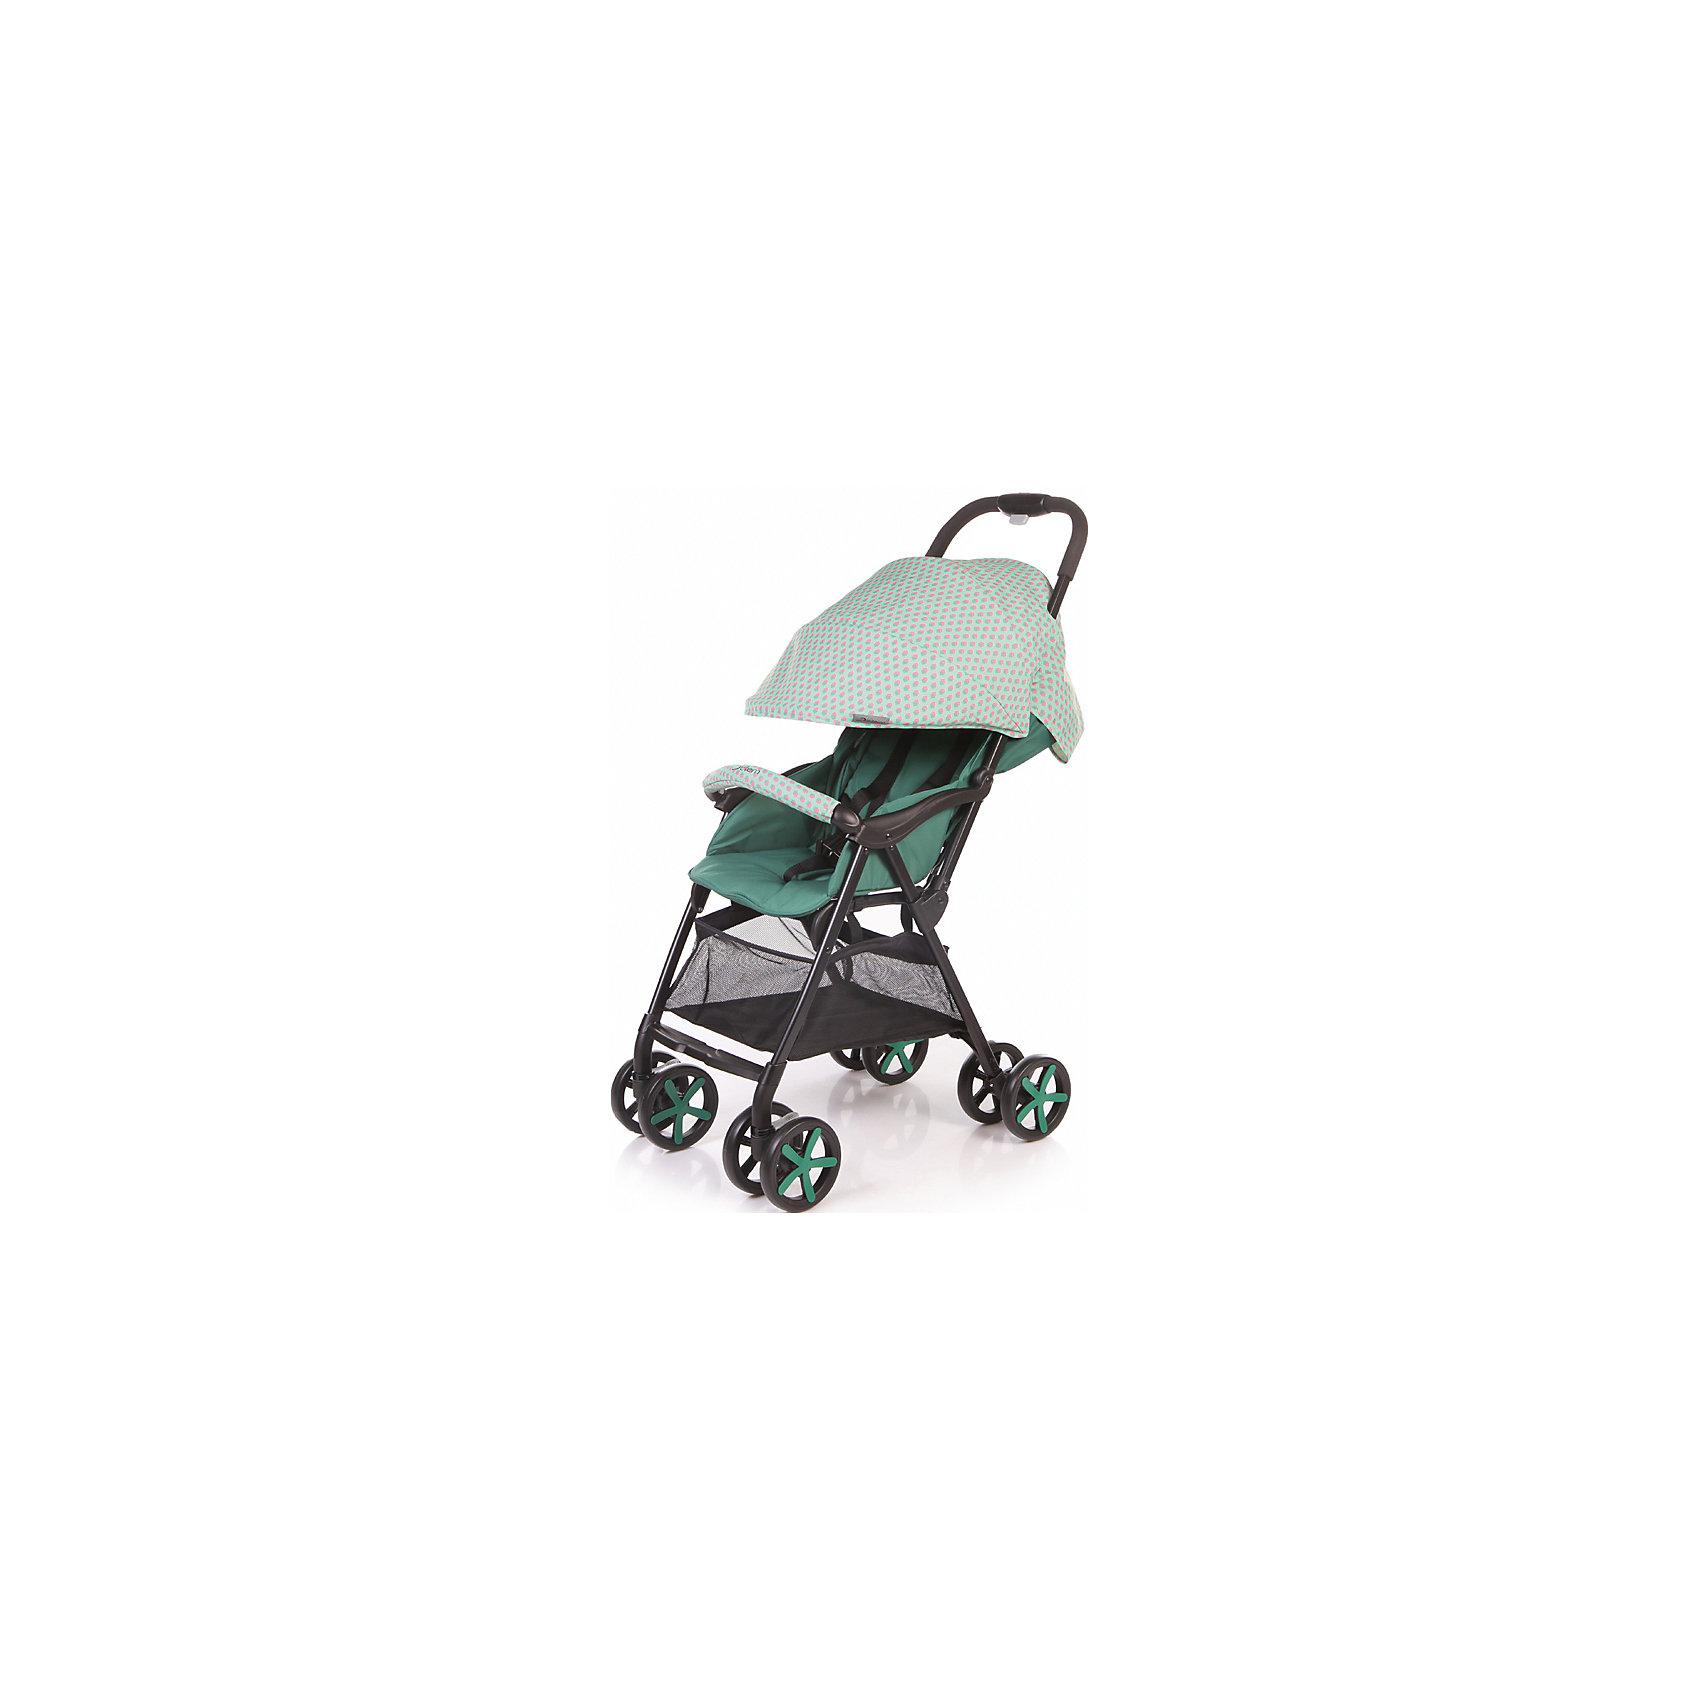 Прогулочная коляска Carbon, Jetem, зелёный